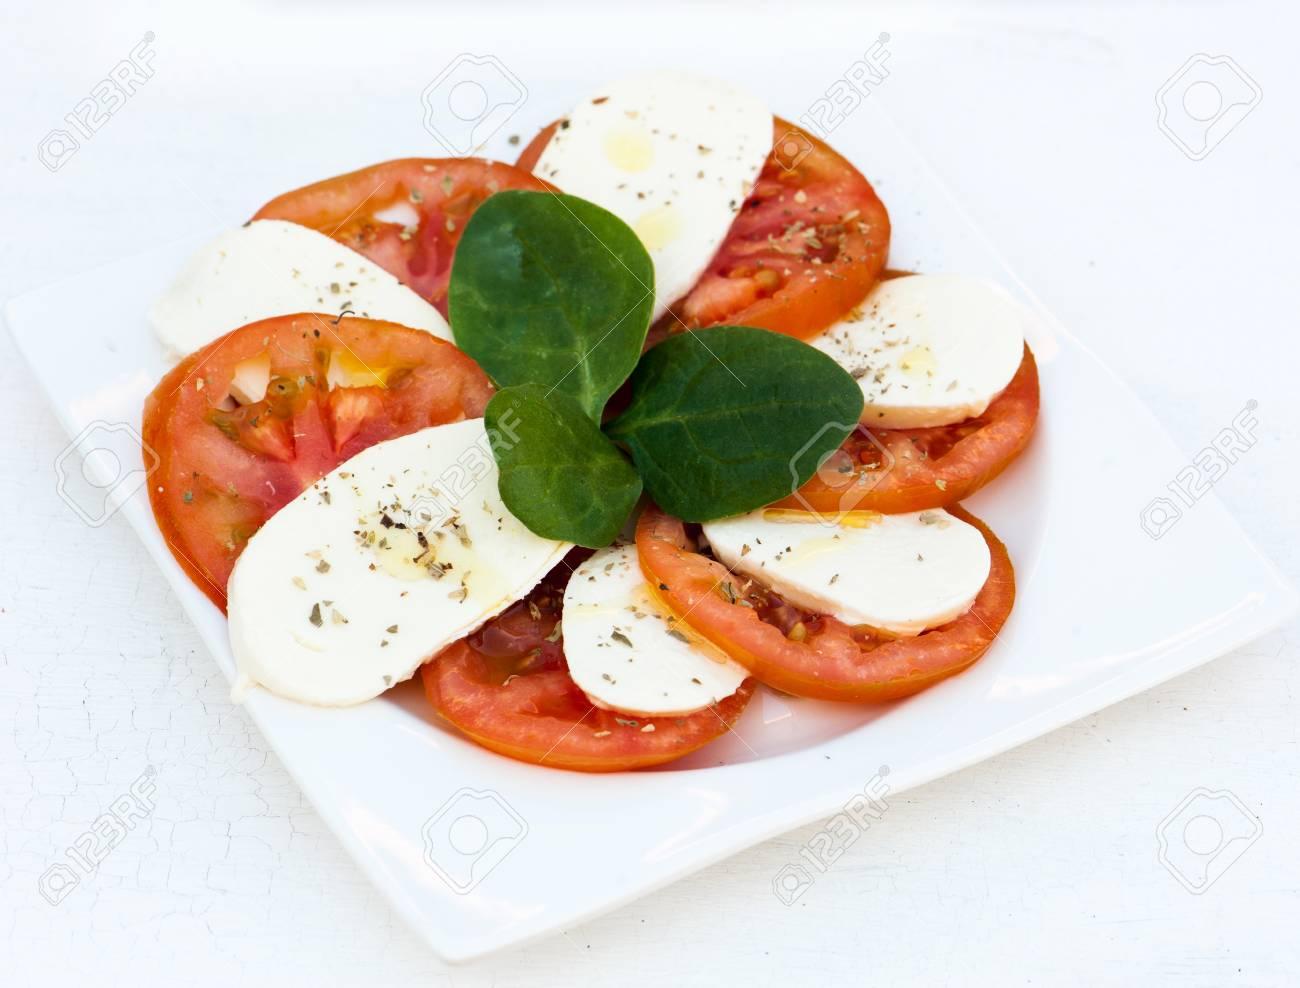 Italian salad with tomatoes and mozzarella Stock Photo - 20753721